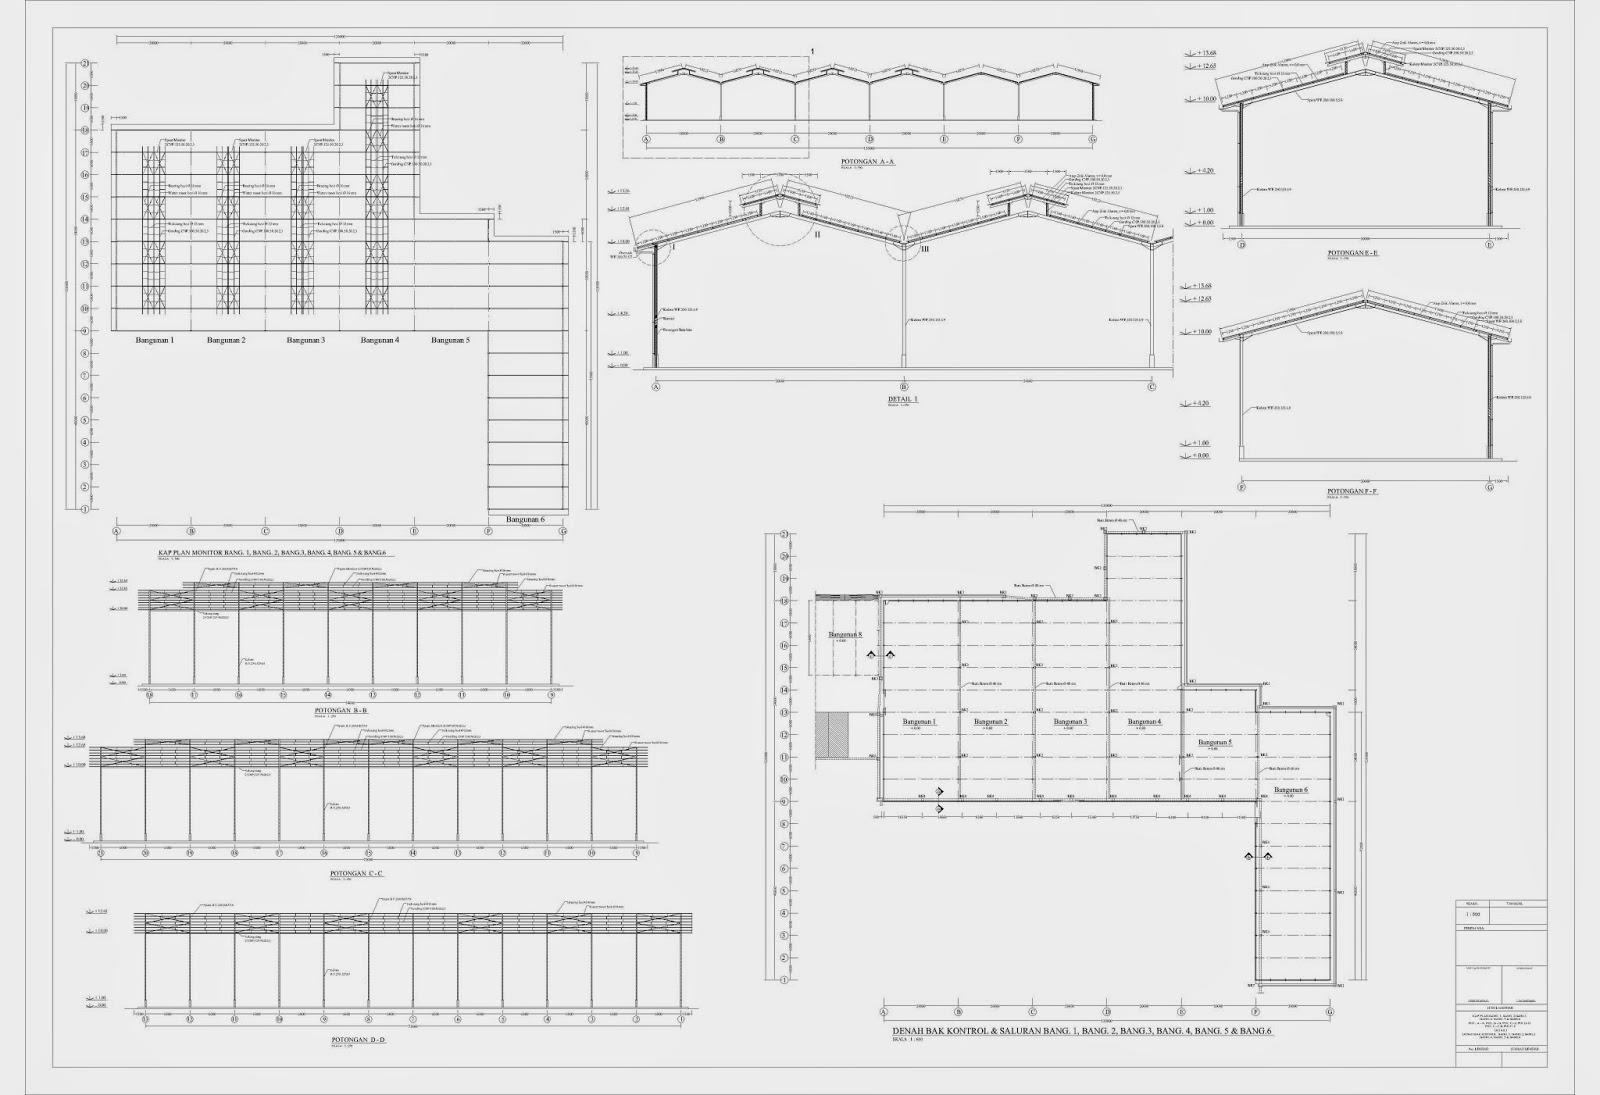 Bowie Workshop Dump Truck Blueprint Konstruksi Baja